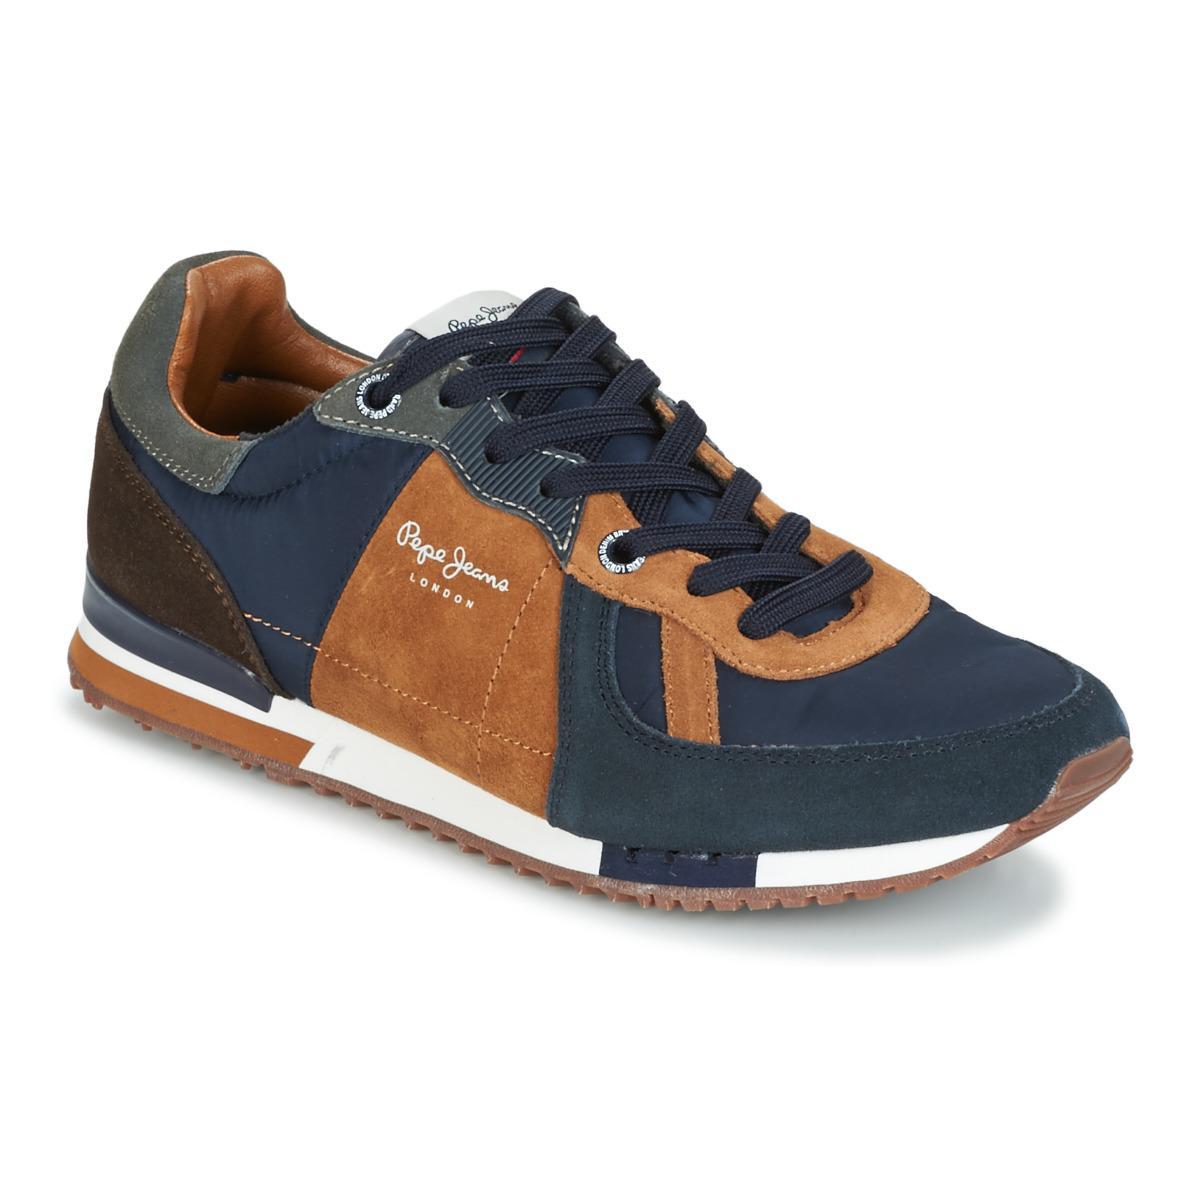 Hommes Jeans Homme En Pour West Chaussures Tinker Lyst Bleu Pepe Aq81wd